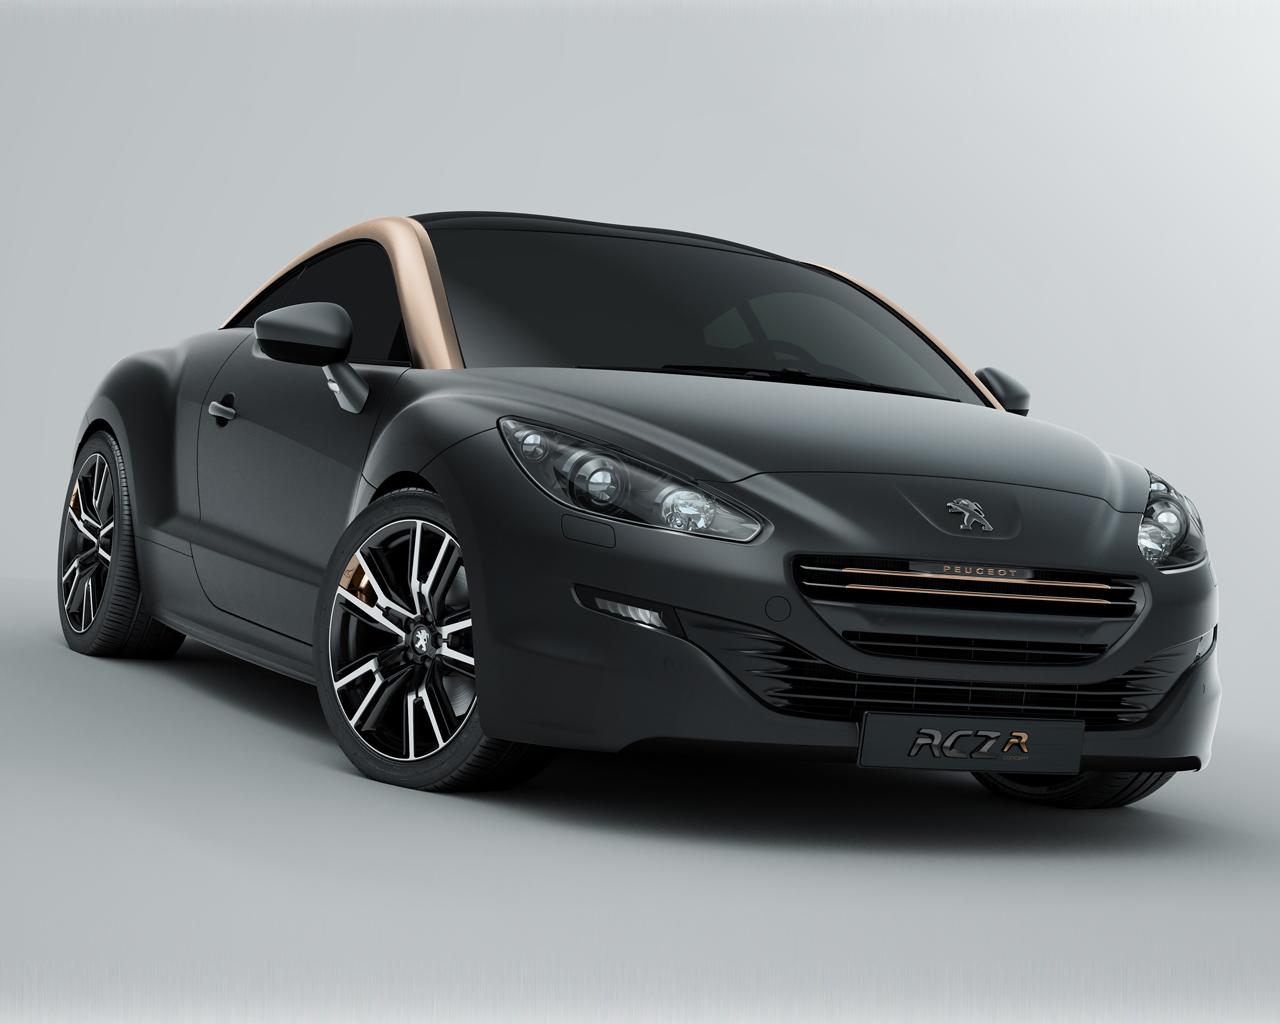 peugeot rcz r concept les concept cars peugeot. Black Bedroom Furniture Sets. Home Design Ideas